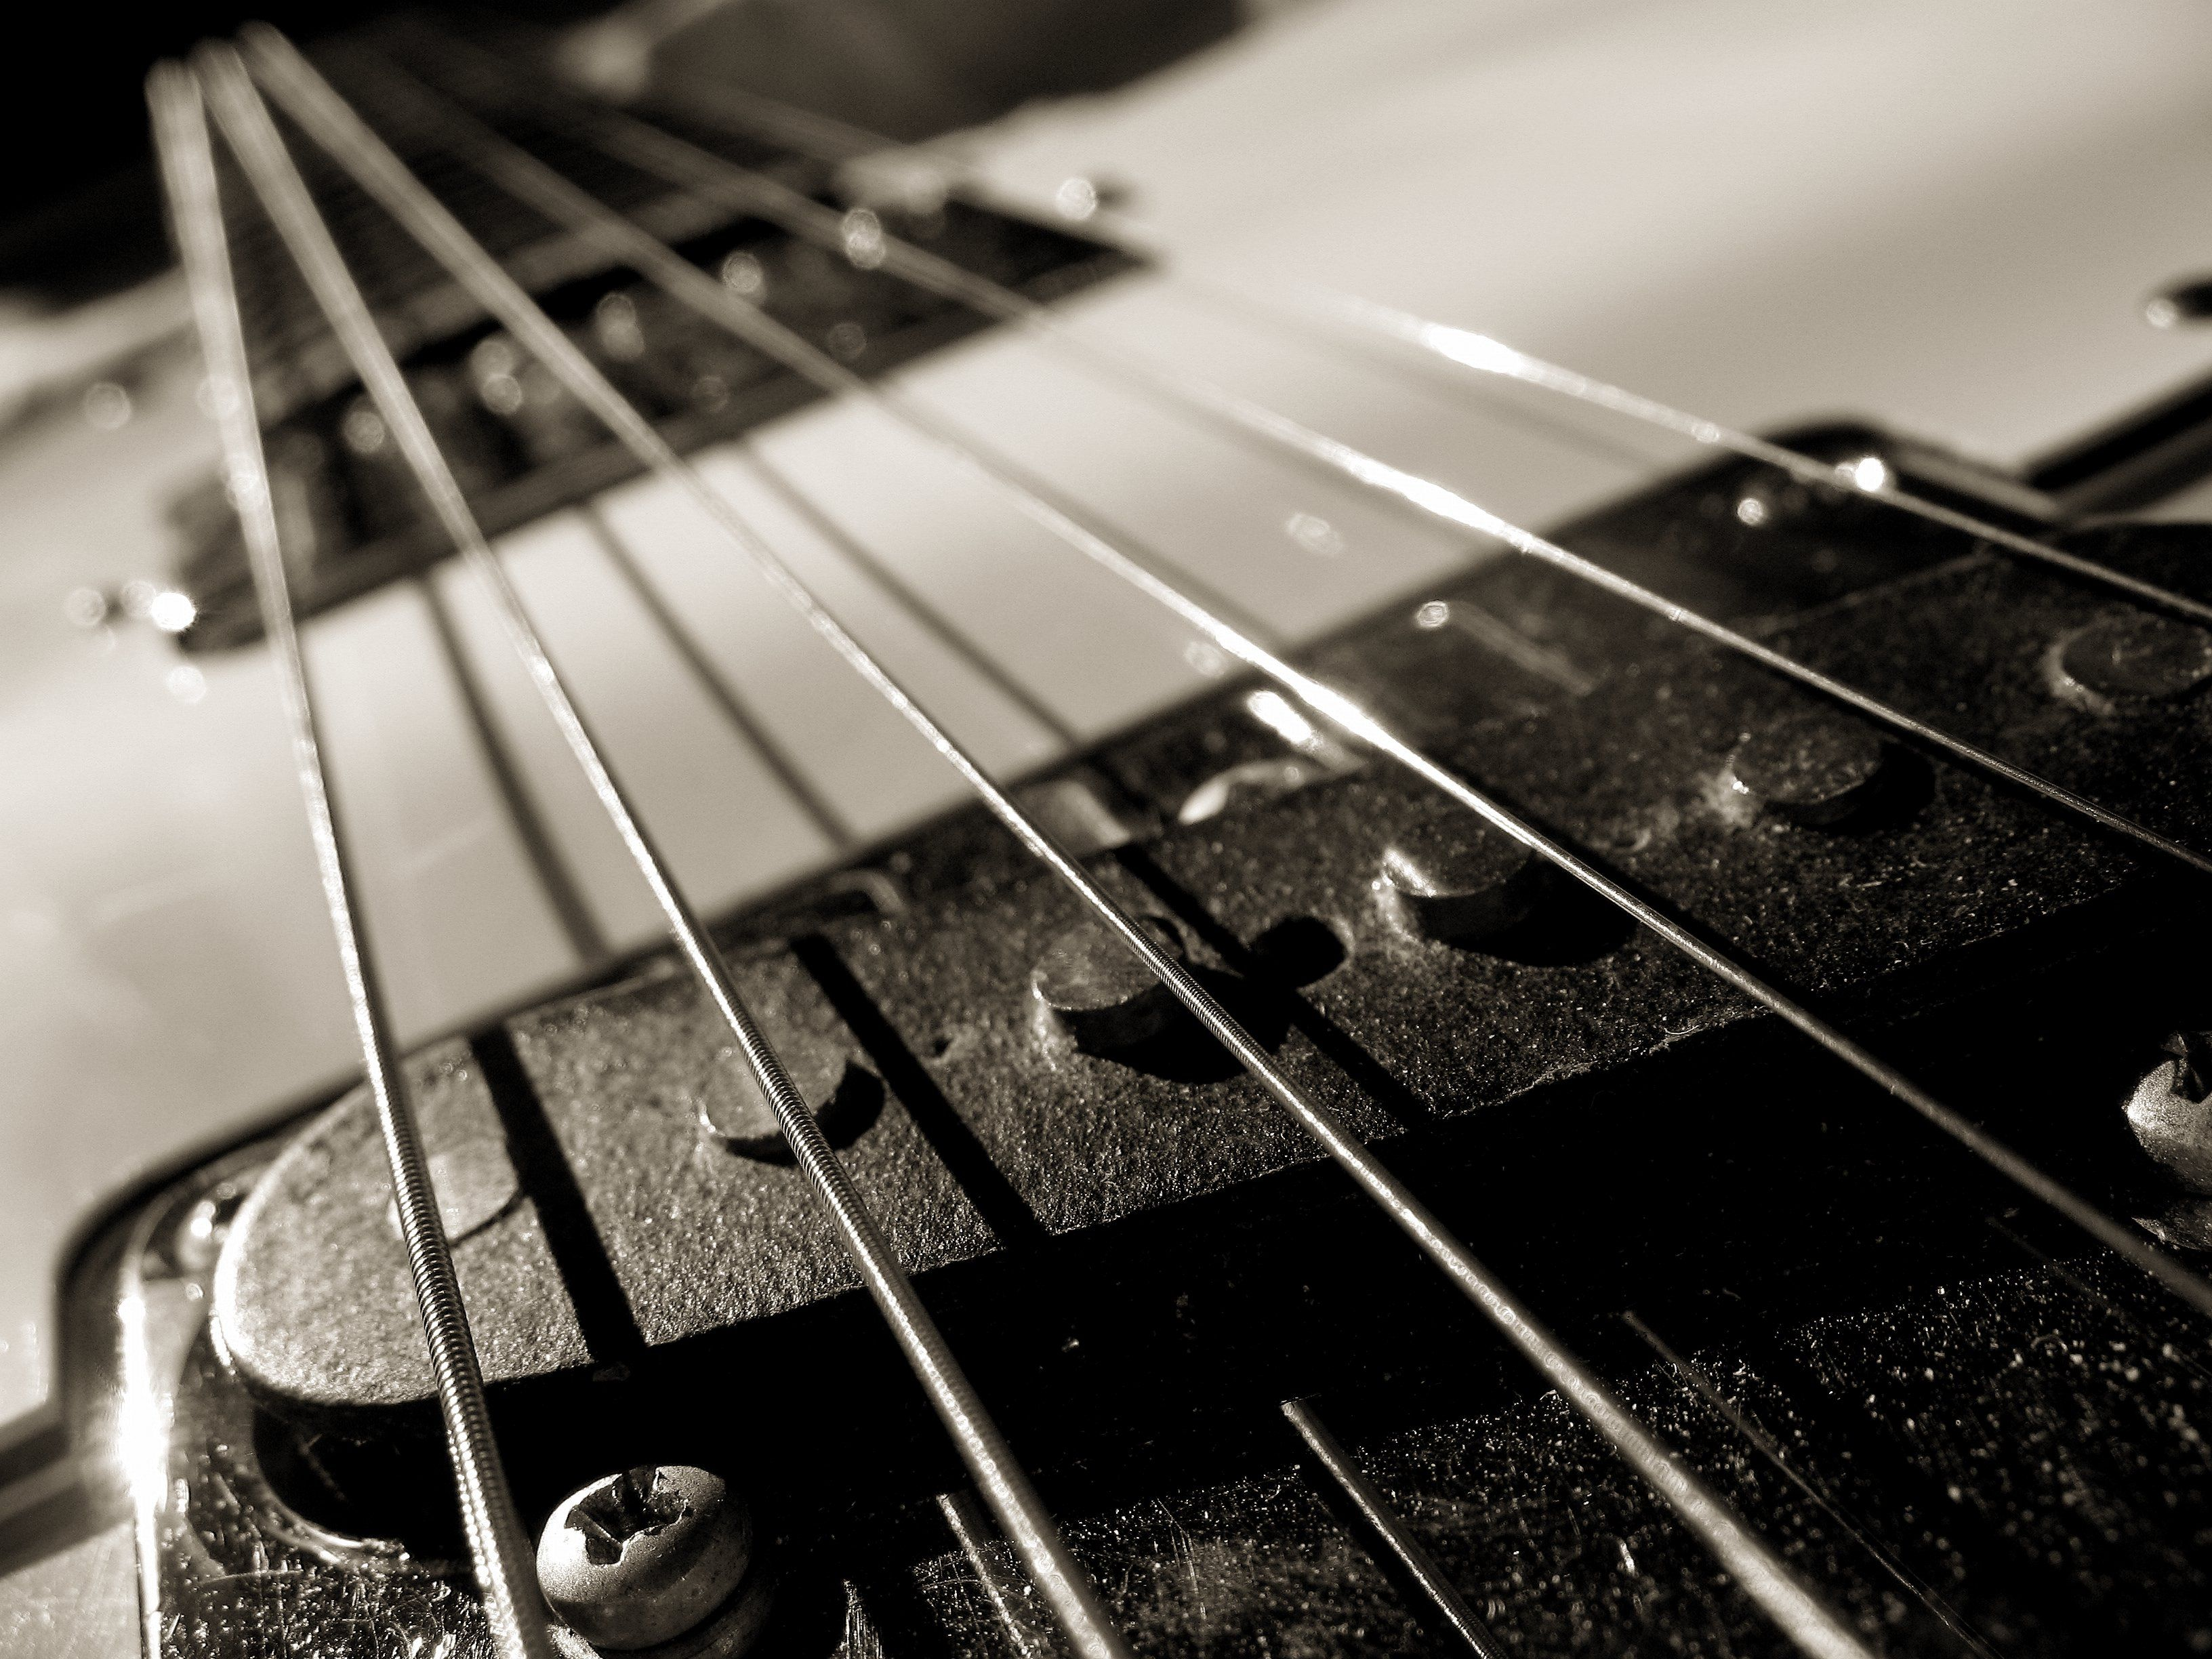 ...music